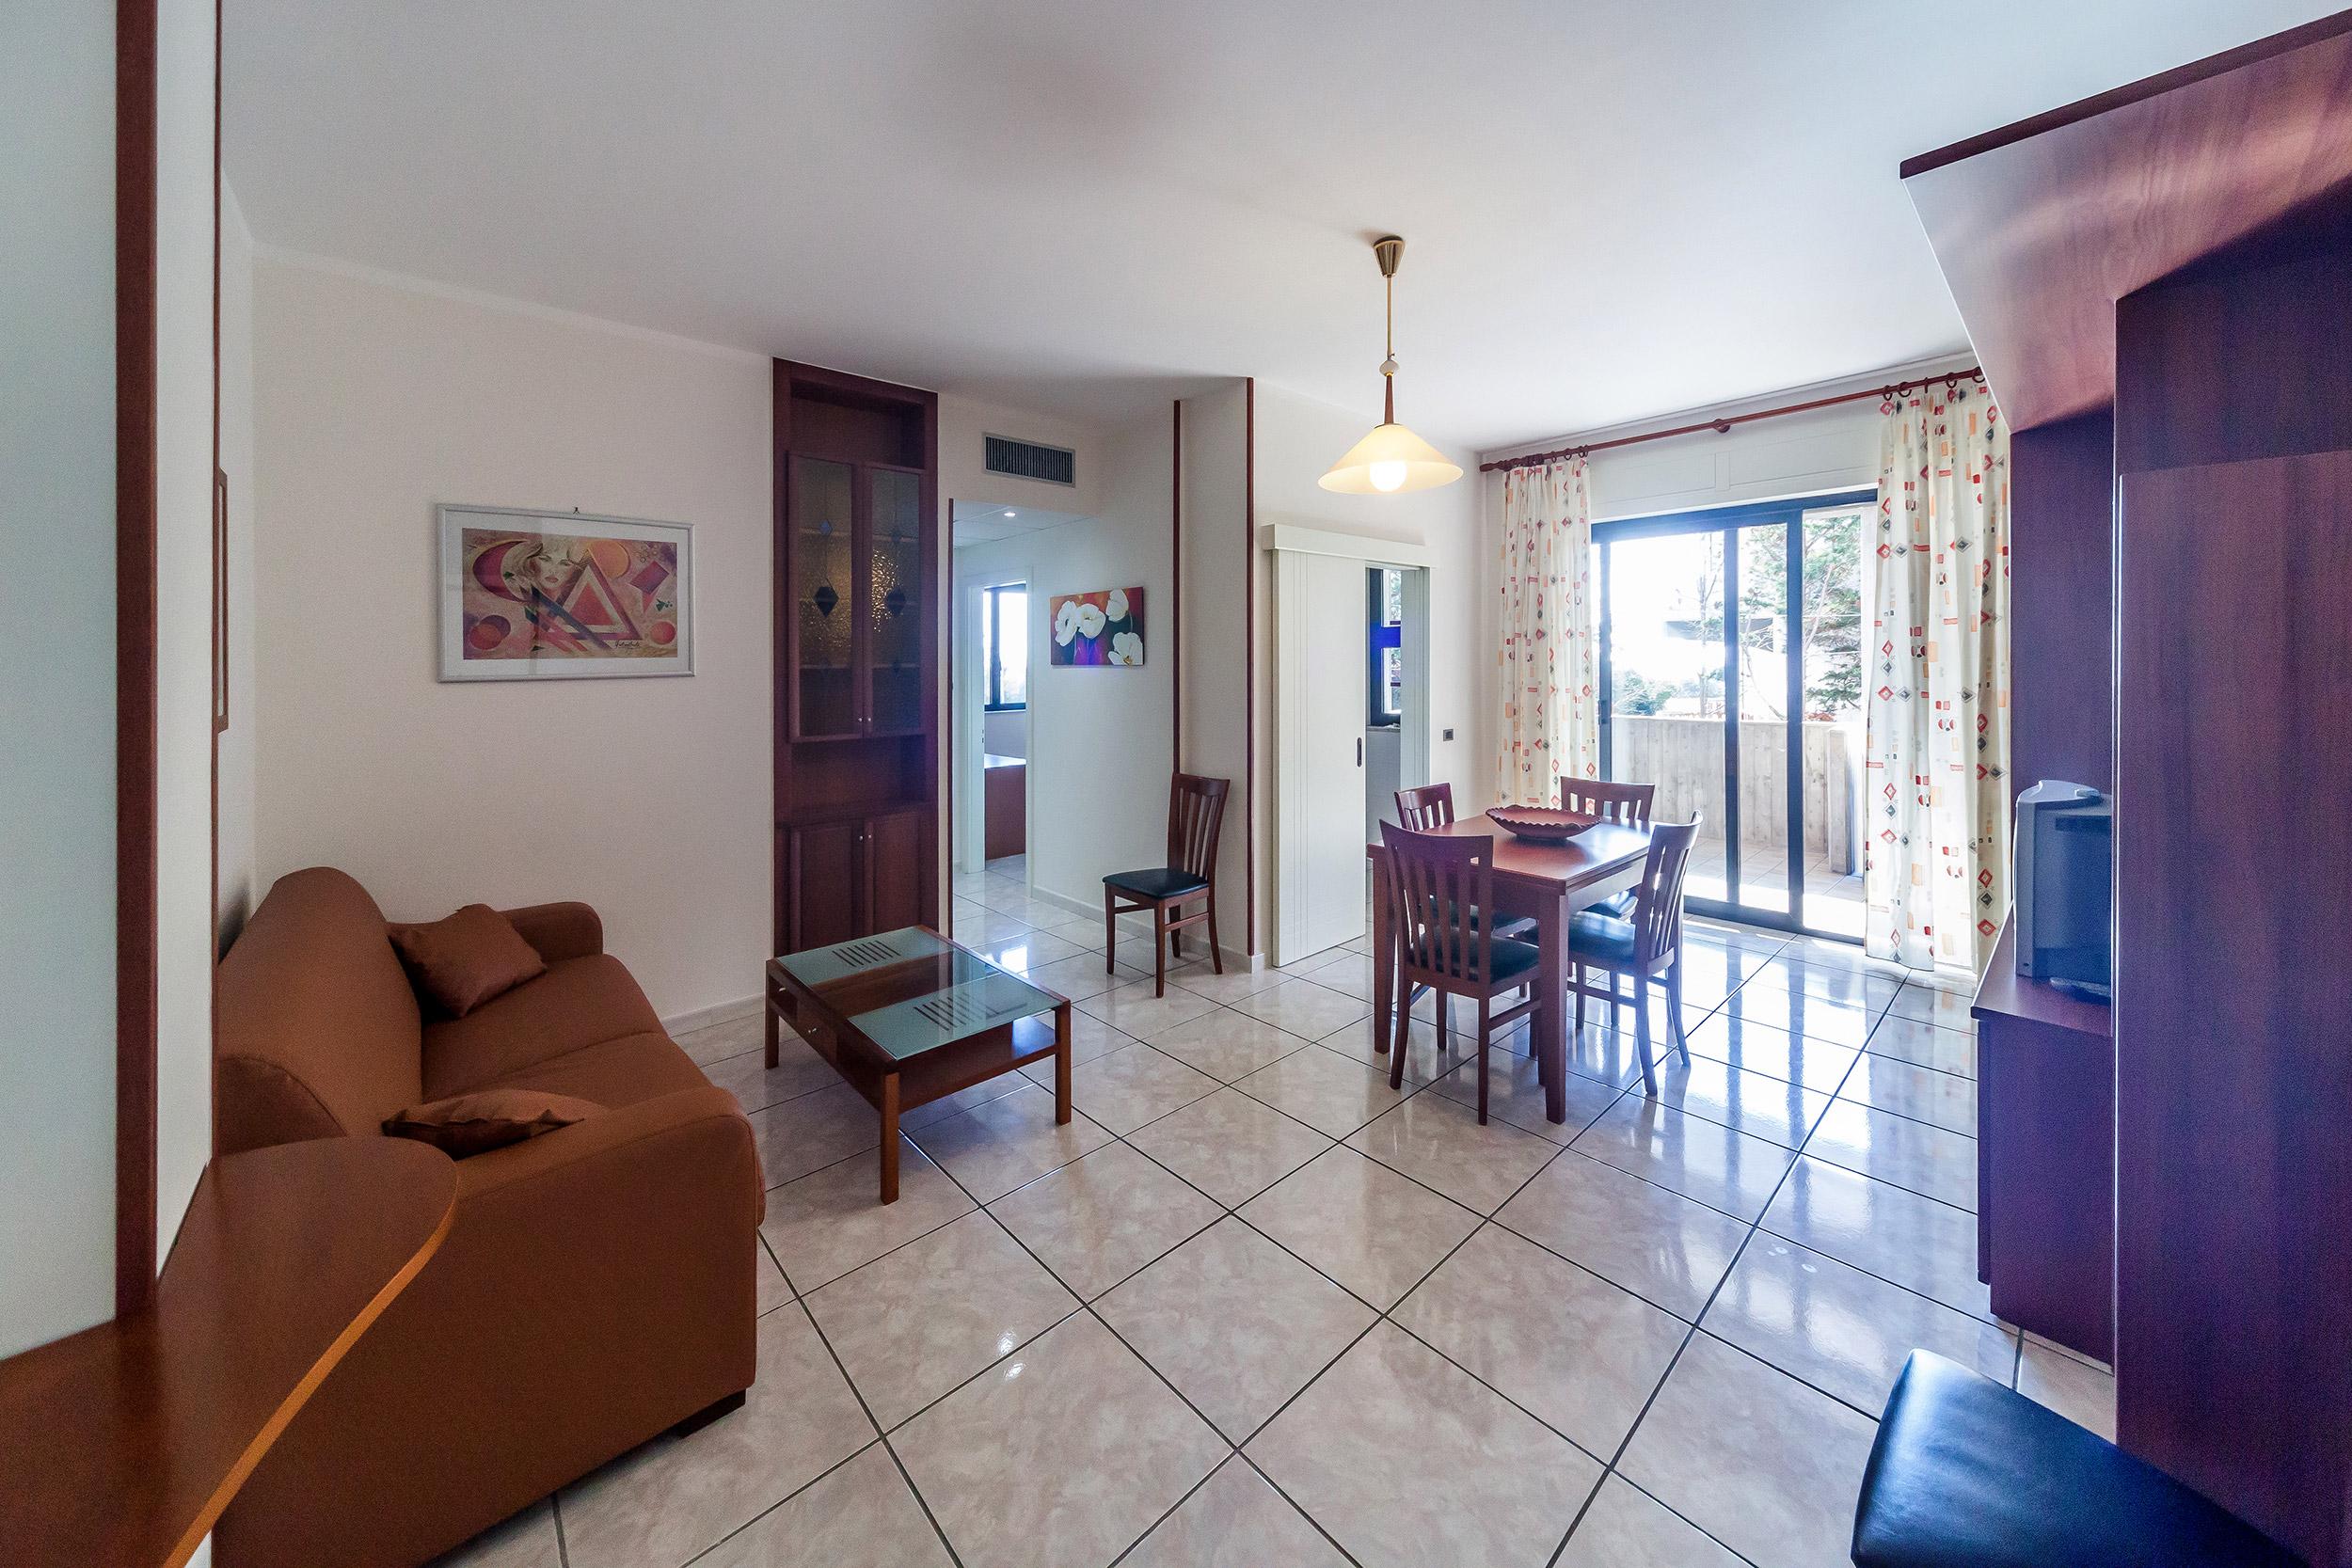 Ferienwohnung Appartamento vista mare a Gallipoli 4/6 posti - Baia Blu Side (2574458), Gallipoli, Lecce, Apulien, Italien, Bild 5